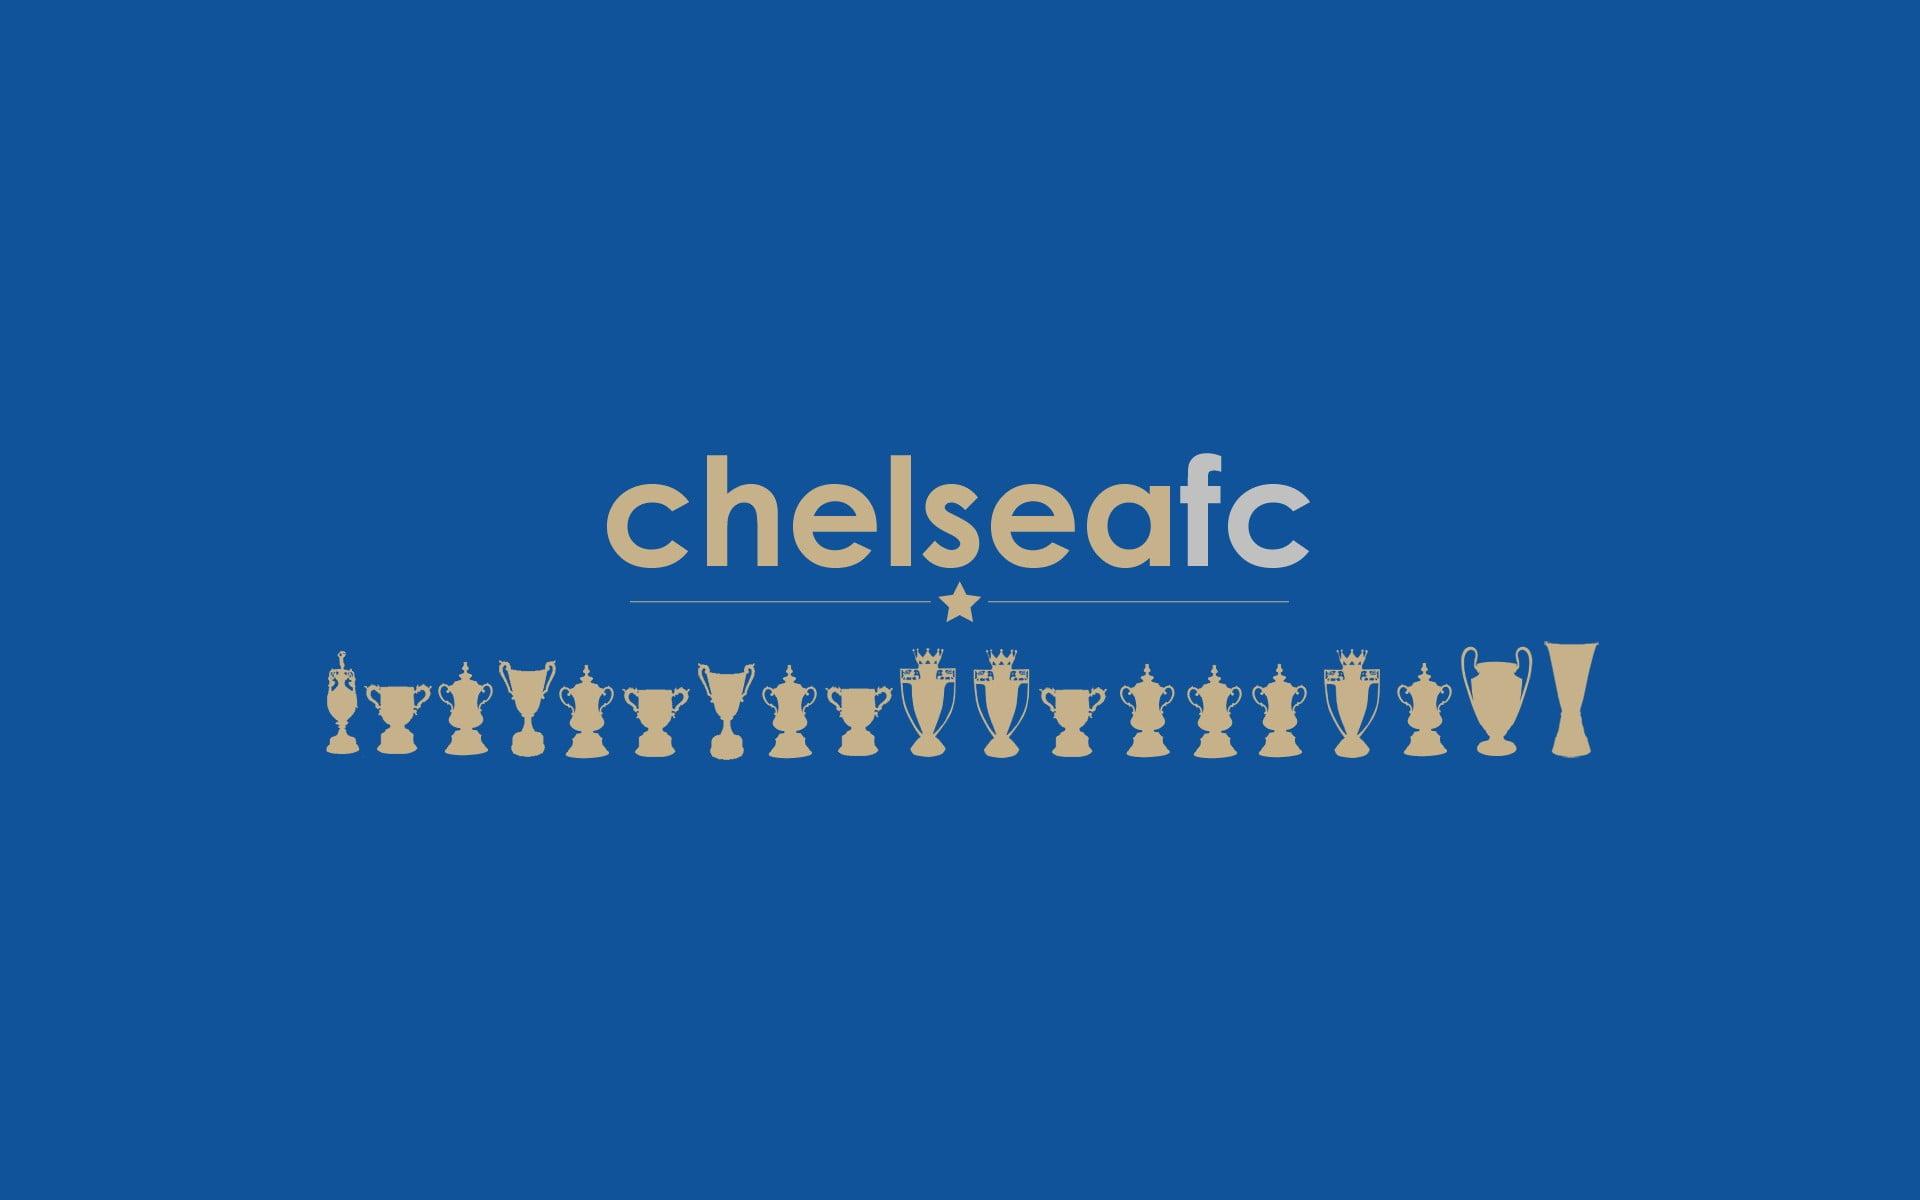 Photo of Chelseafc logo HD wallpaper Wallpaper Flare 1920x1200